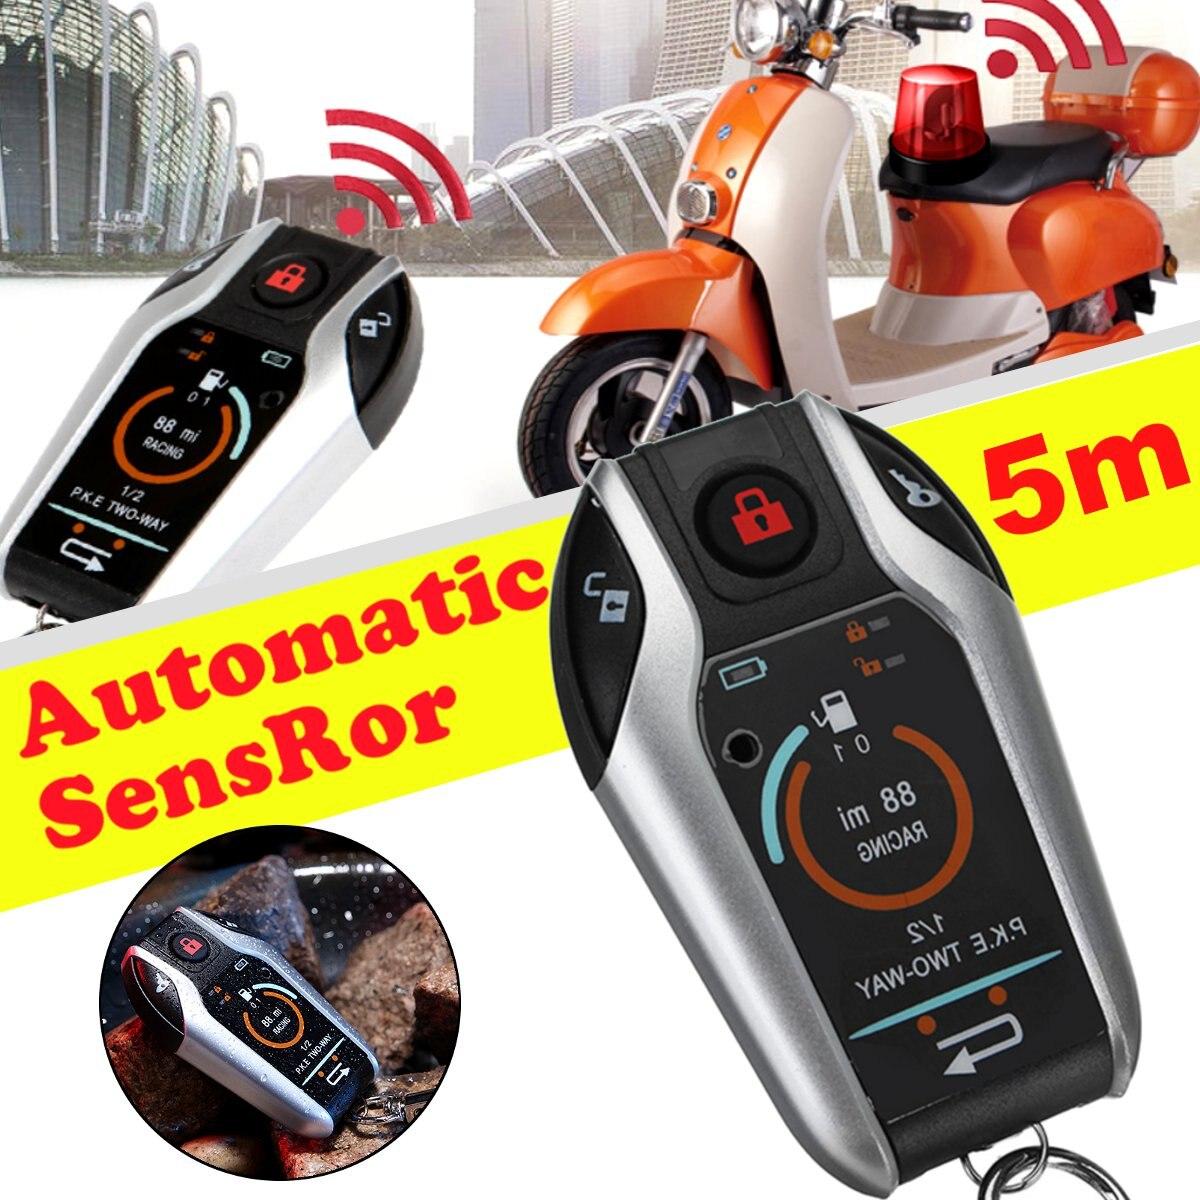 5M Automatic Sensor 2 Way Engine Start Motorcycle Bike Scooter PKE Alarm System Anti-theft Security Remote Control Alarm Lock